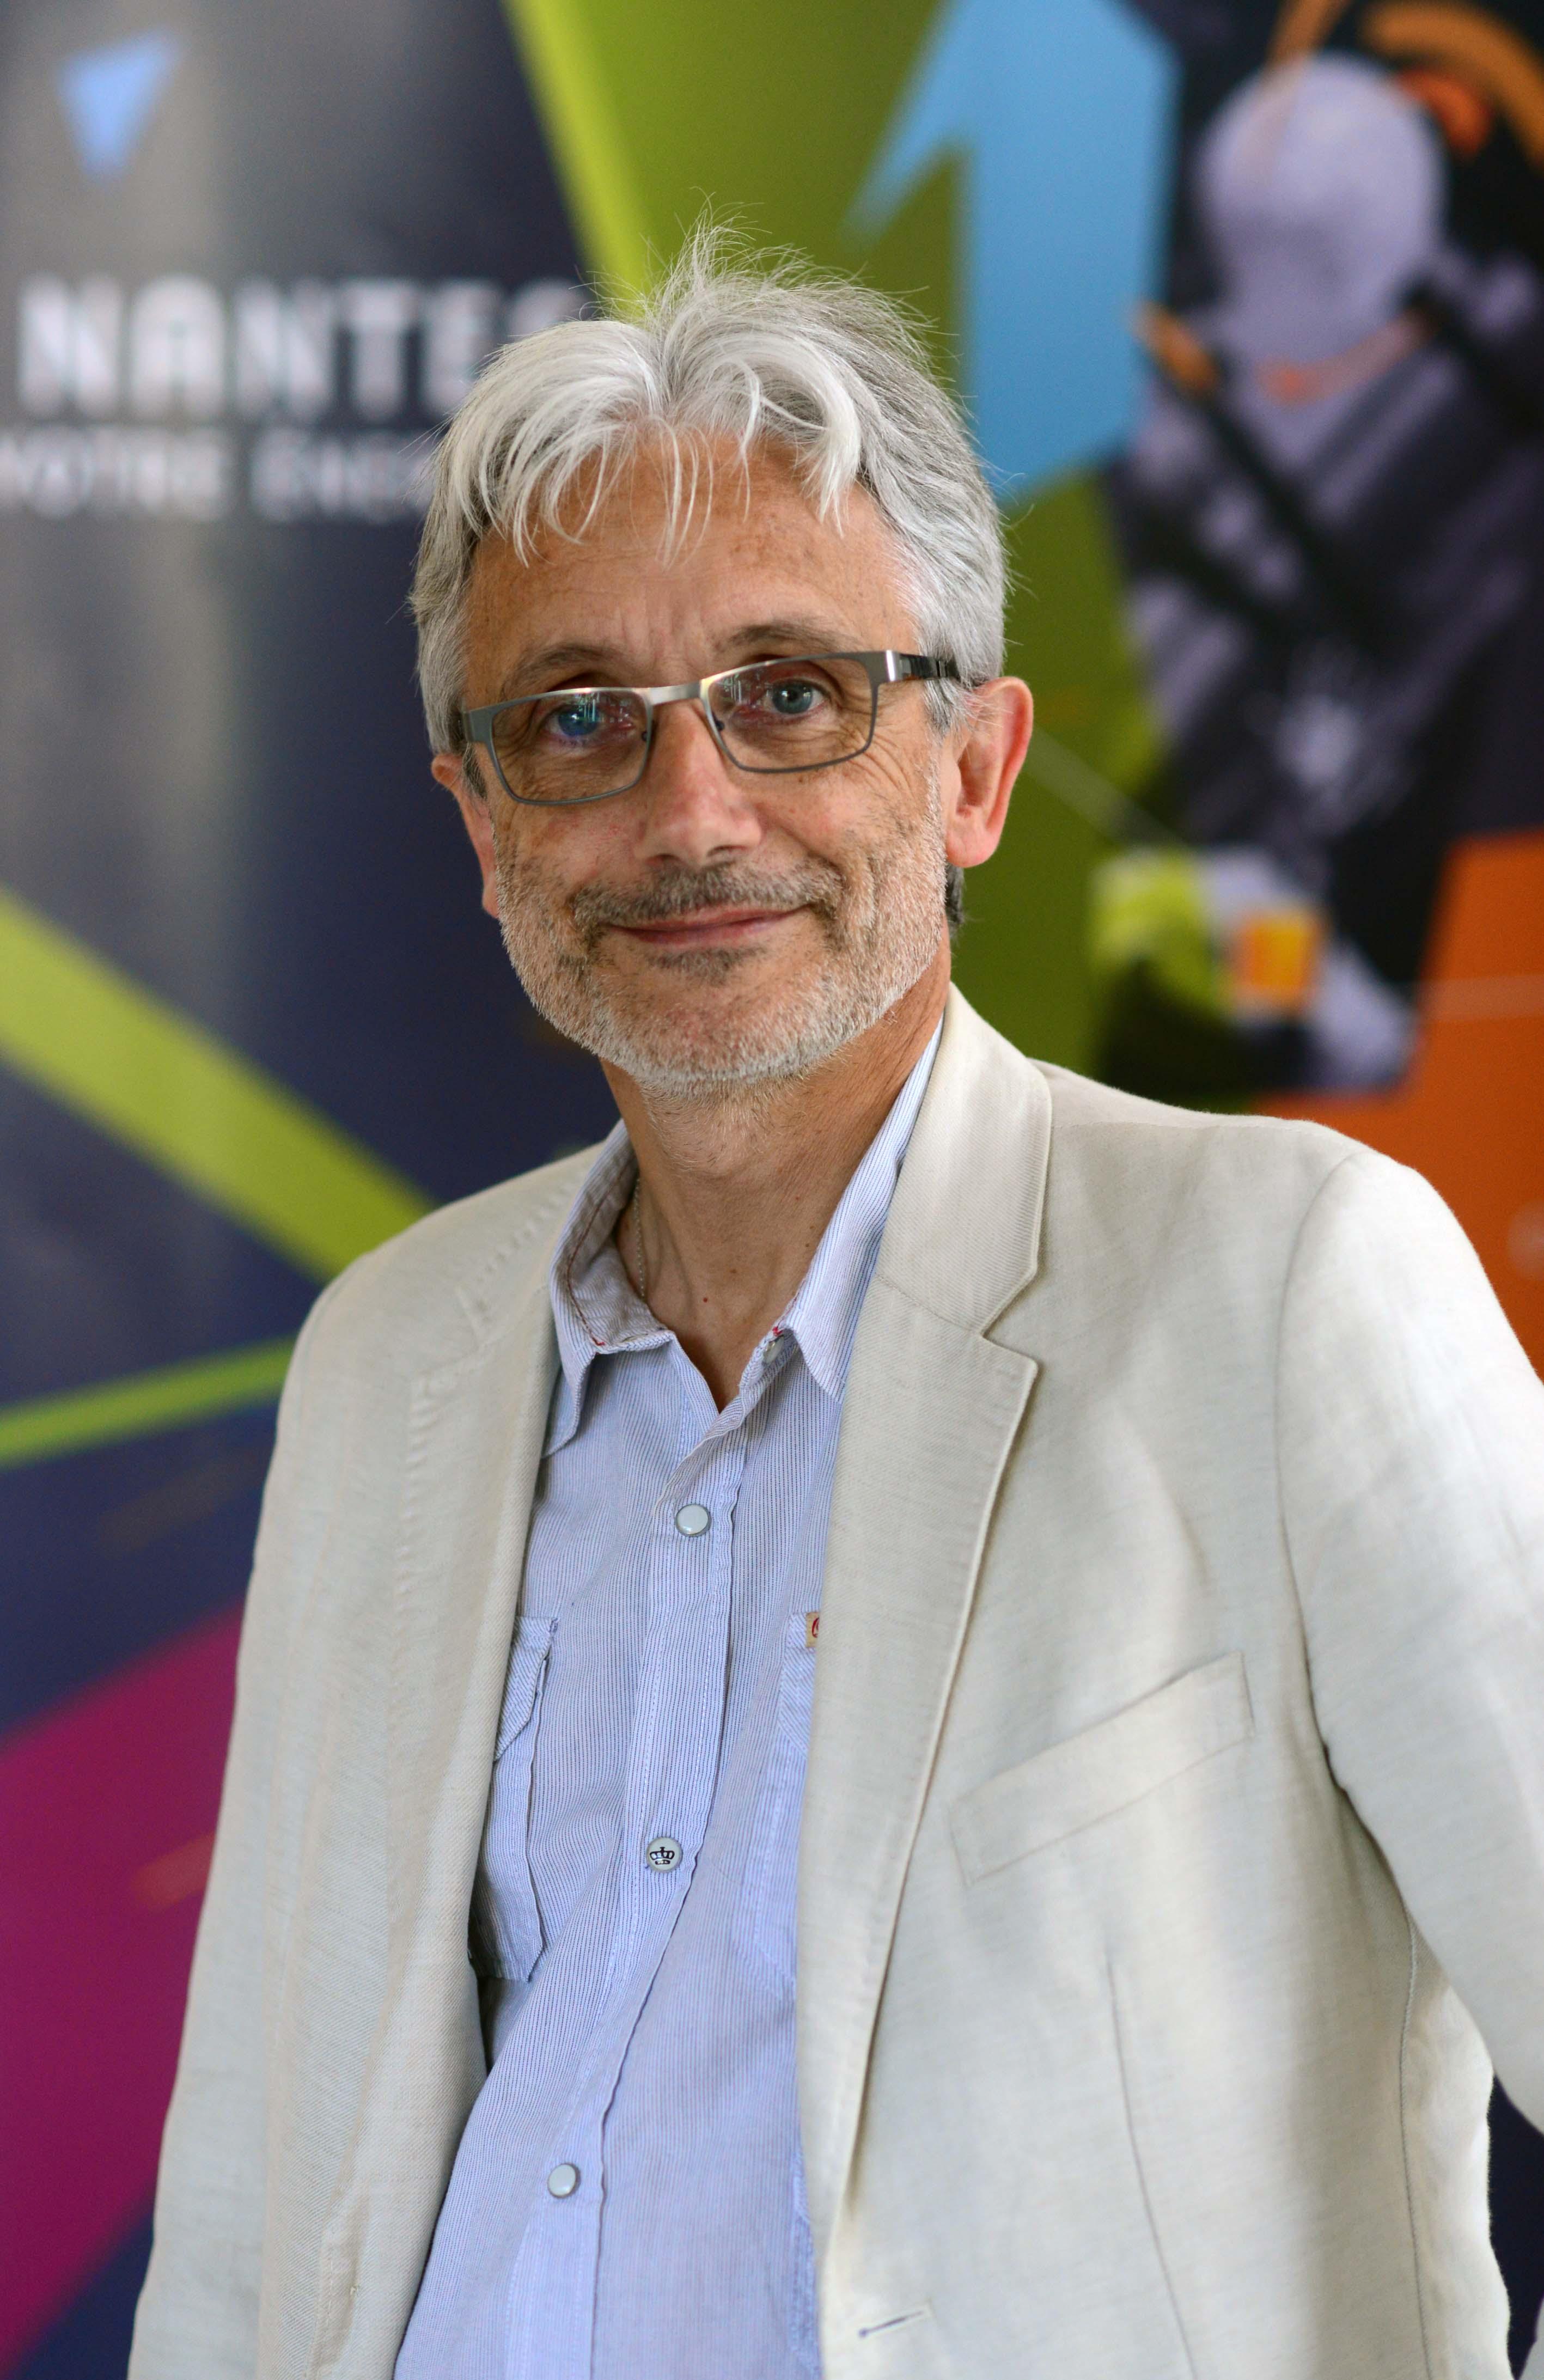 HETET Jean-Francois